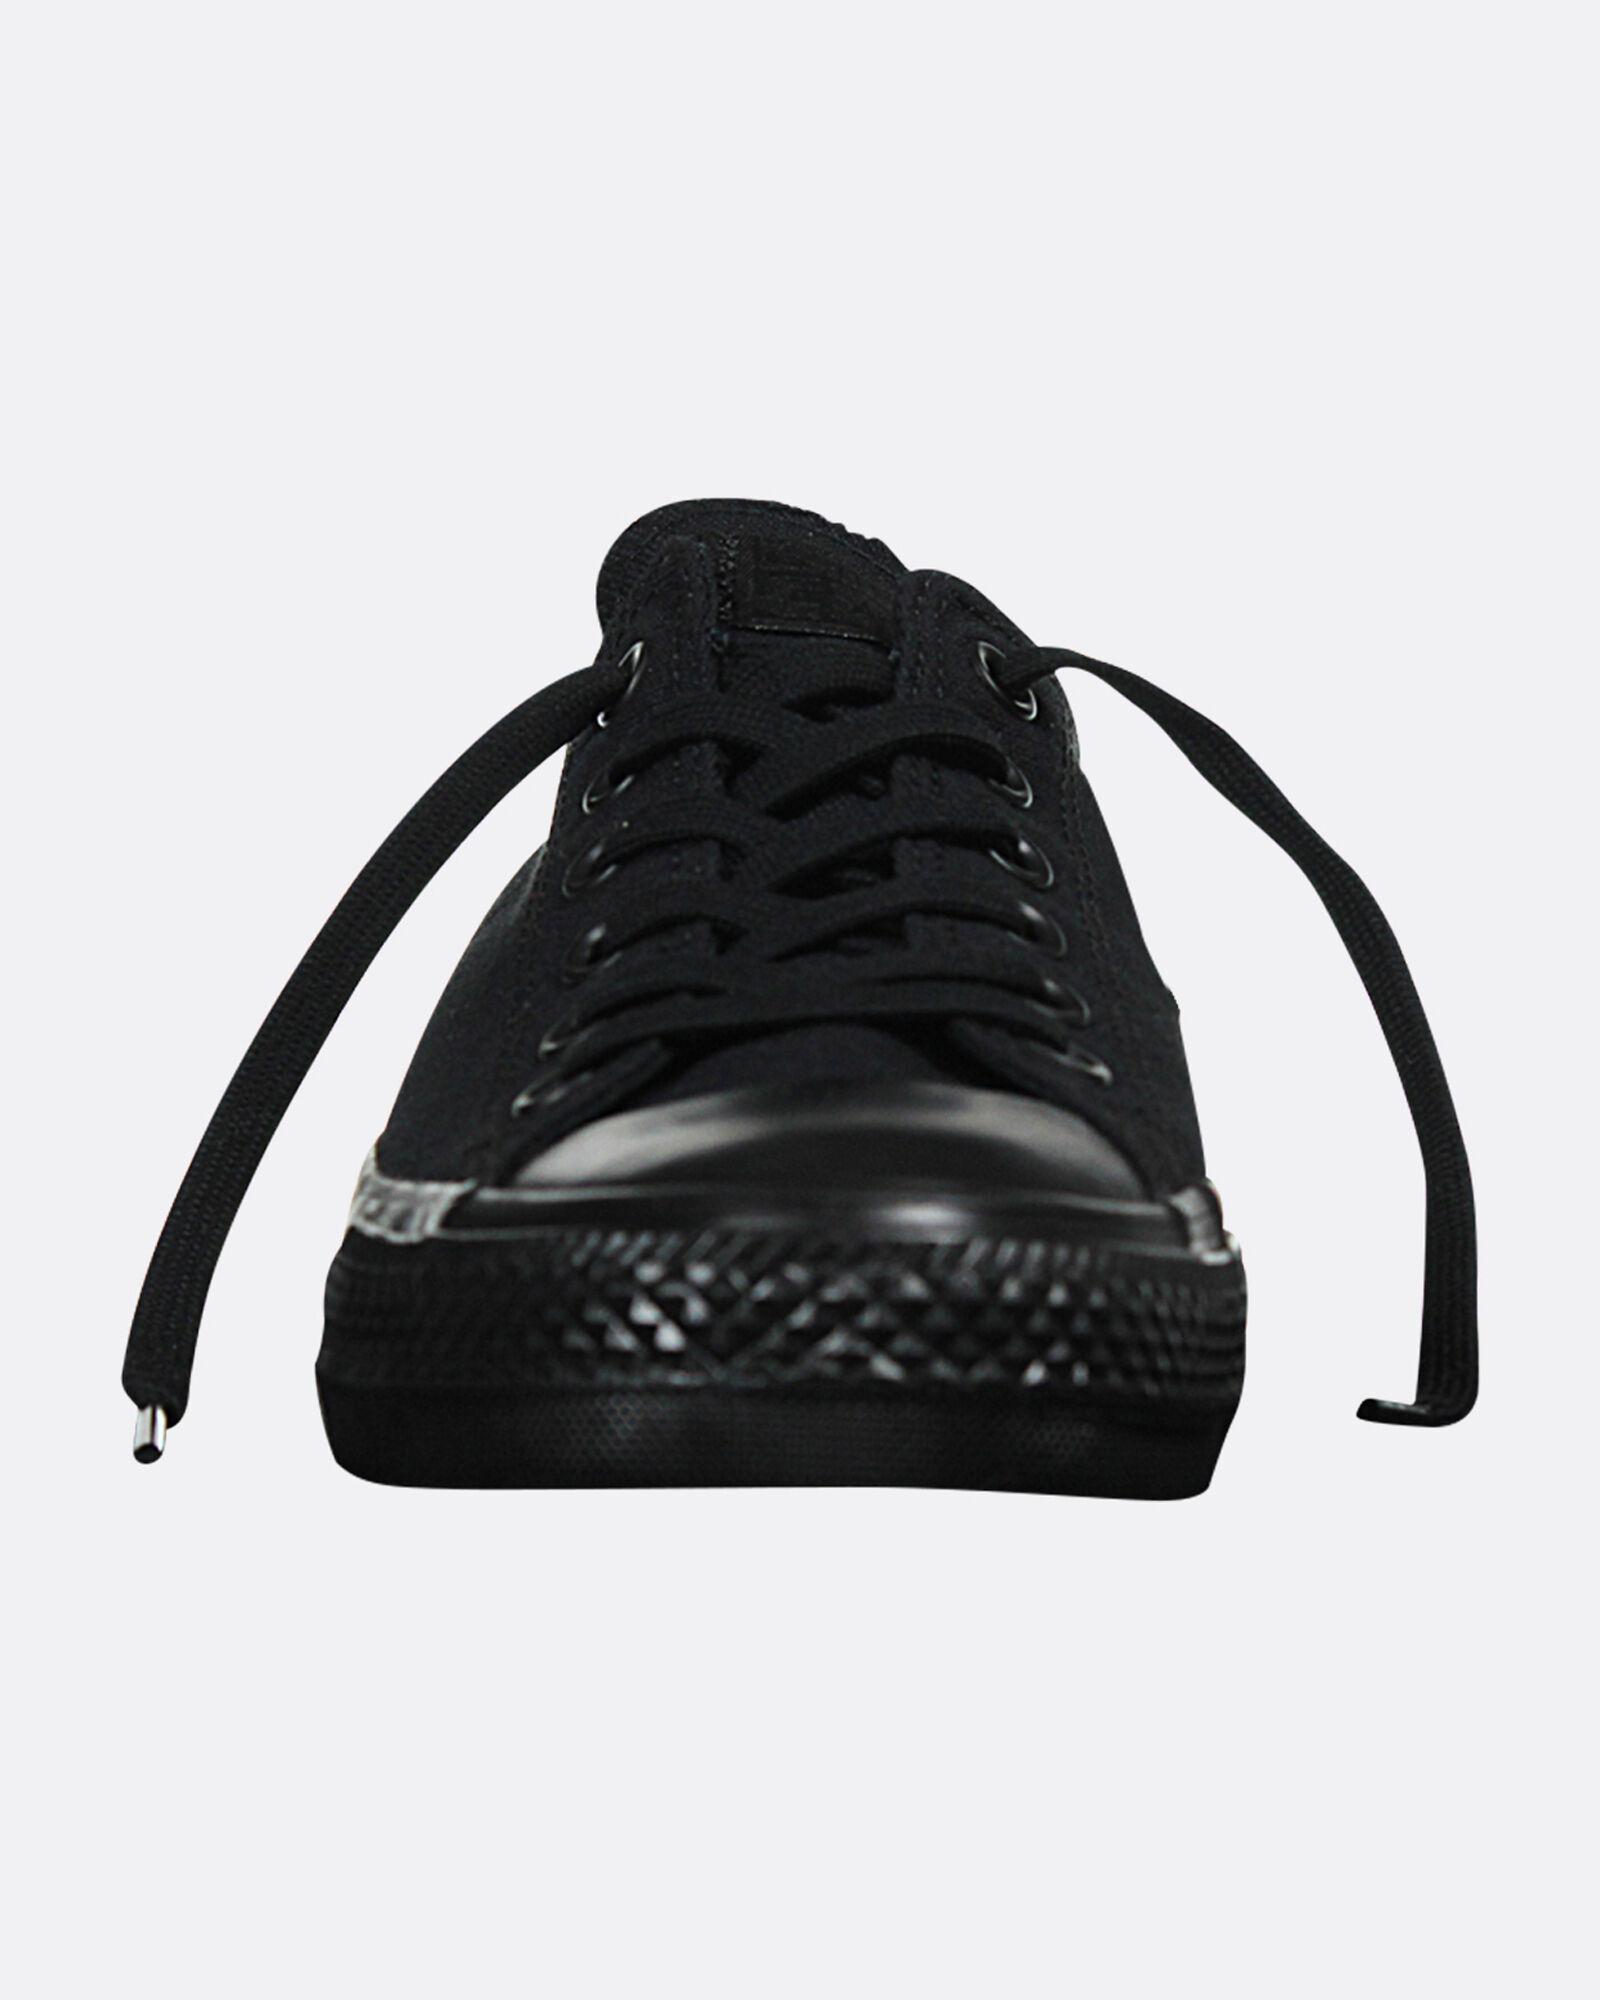 Chuck Shoe All Taylor Blackblack Pro Converse Stars Low jVpLSMGUqz